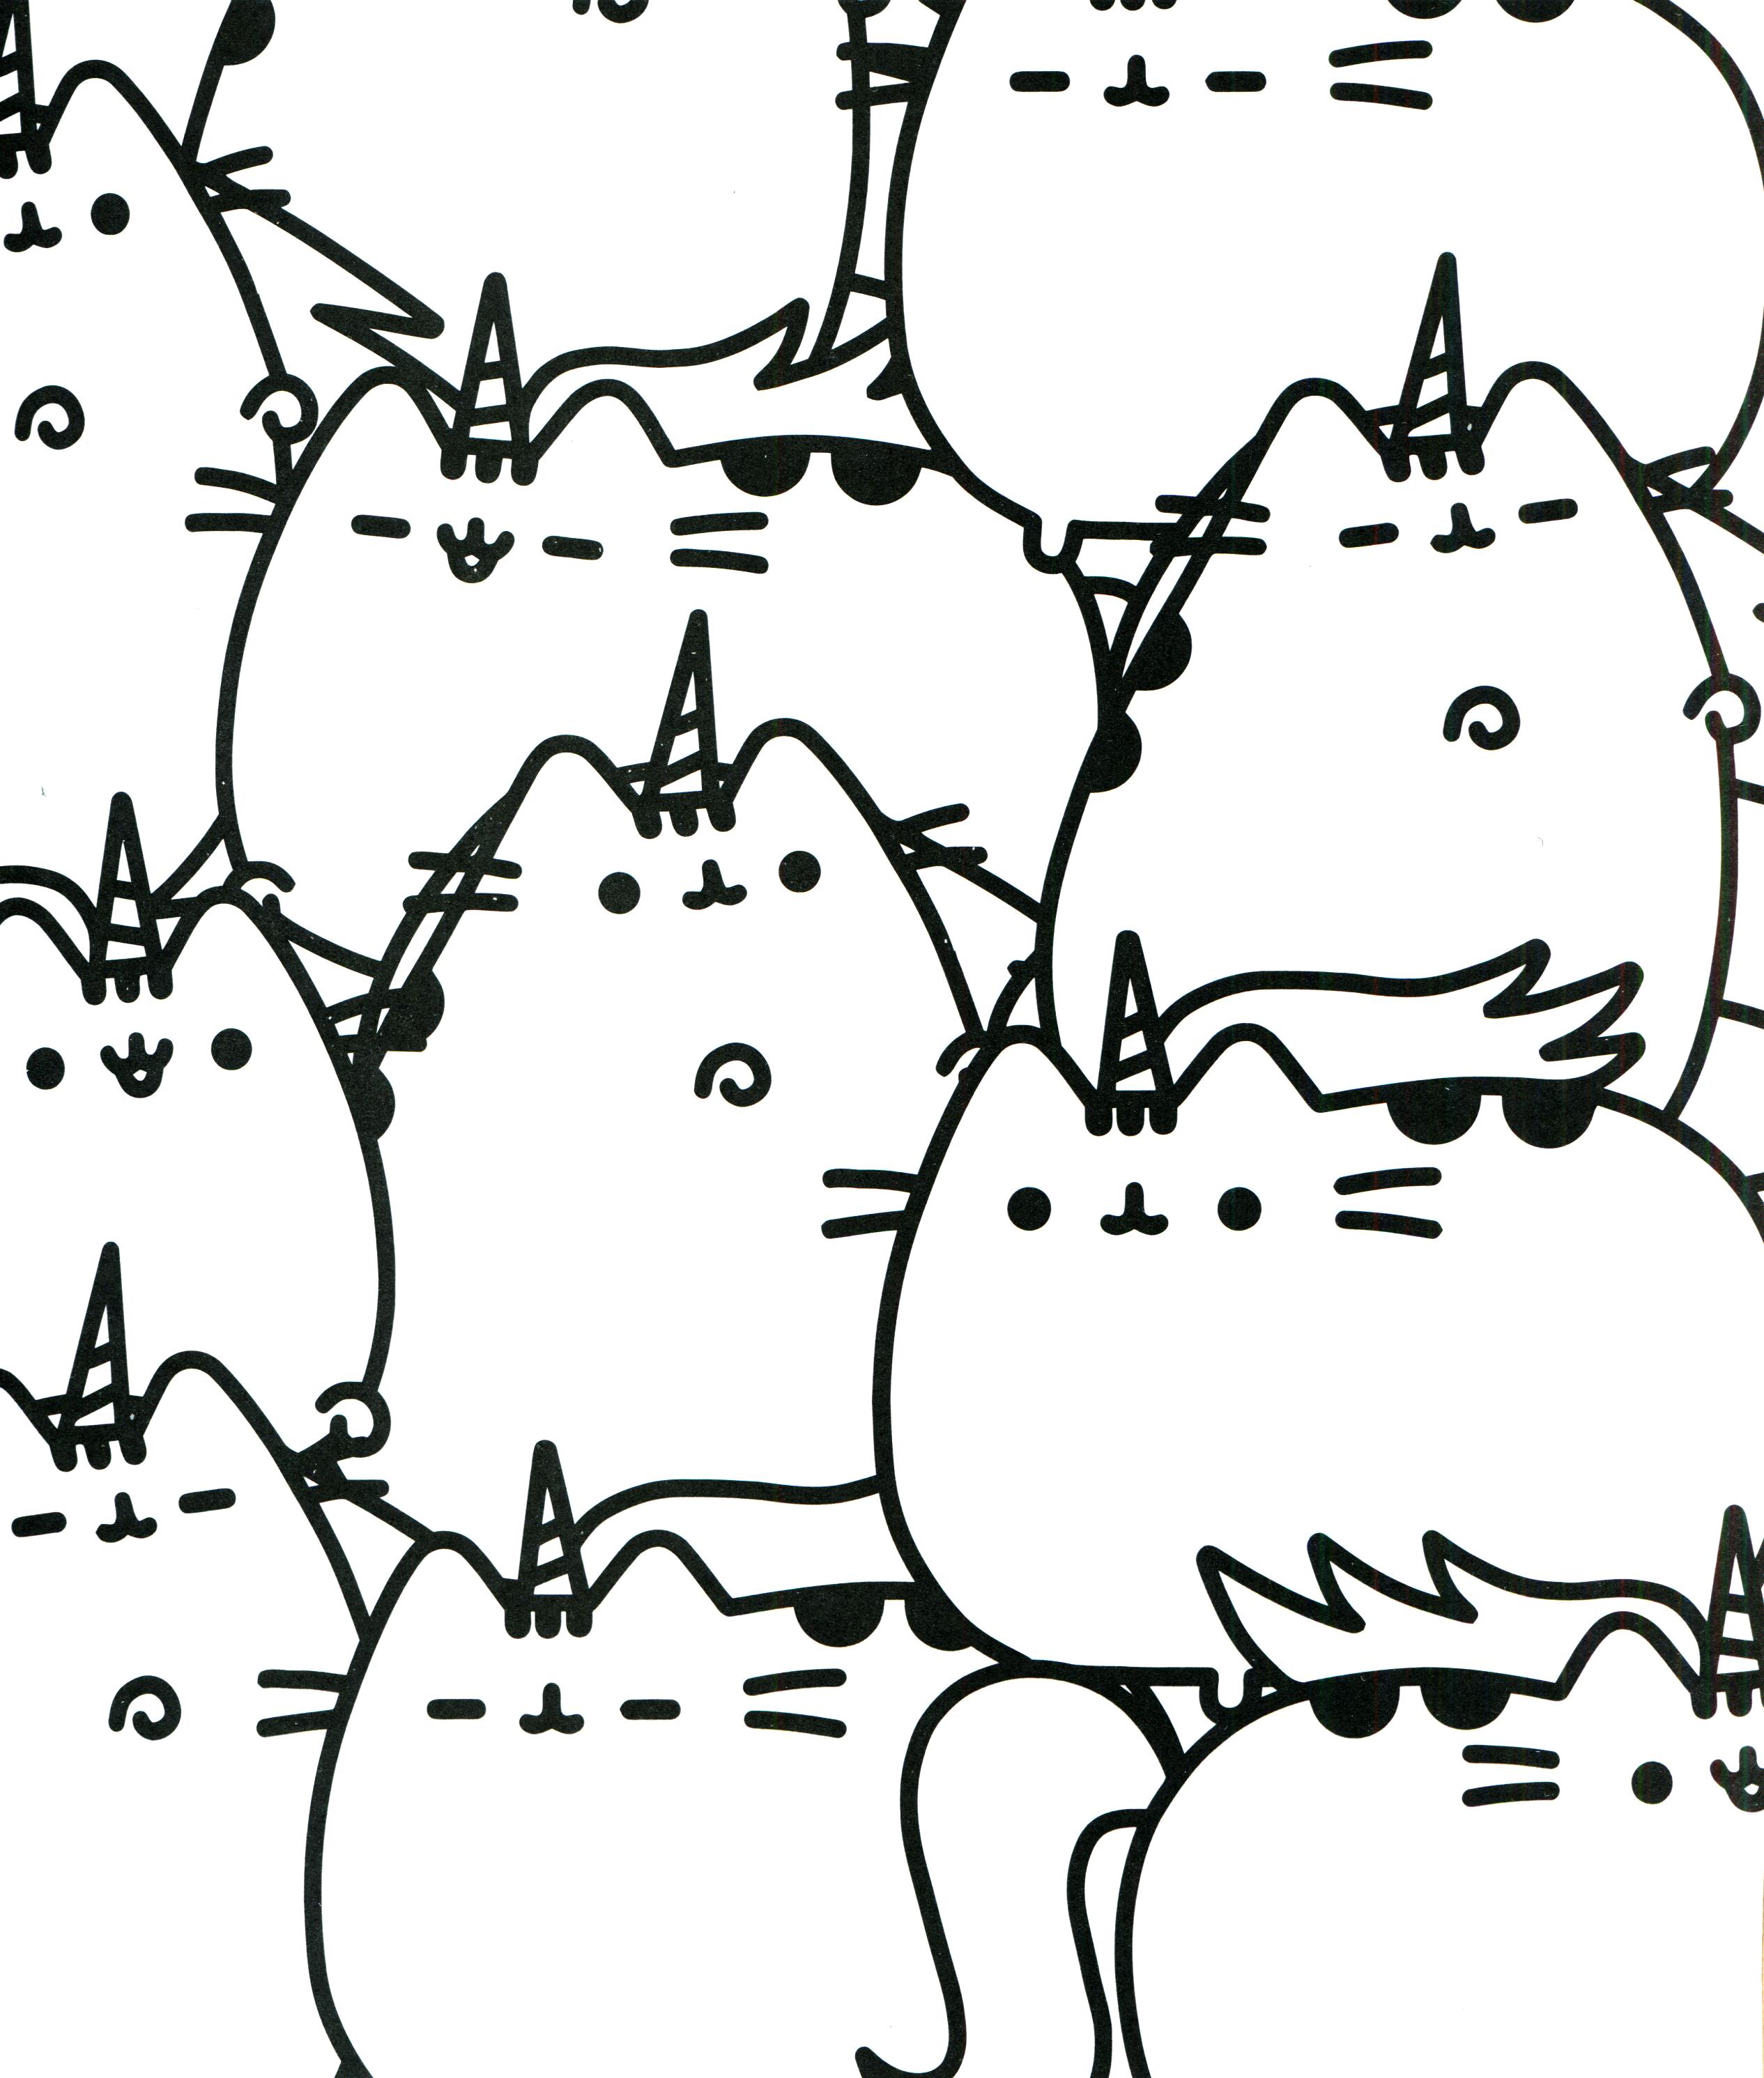 Pusheen Coloring Book Pusheen Pusheen The Cat Coloring Pages